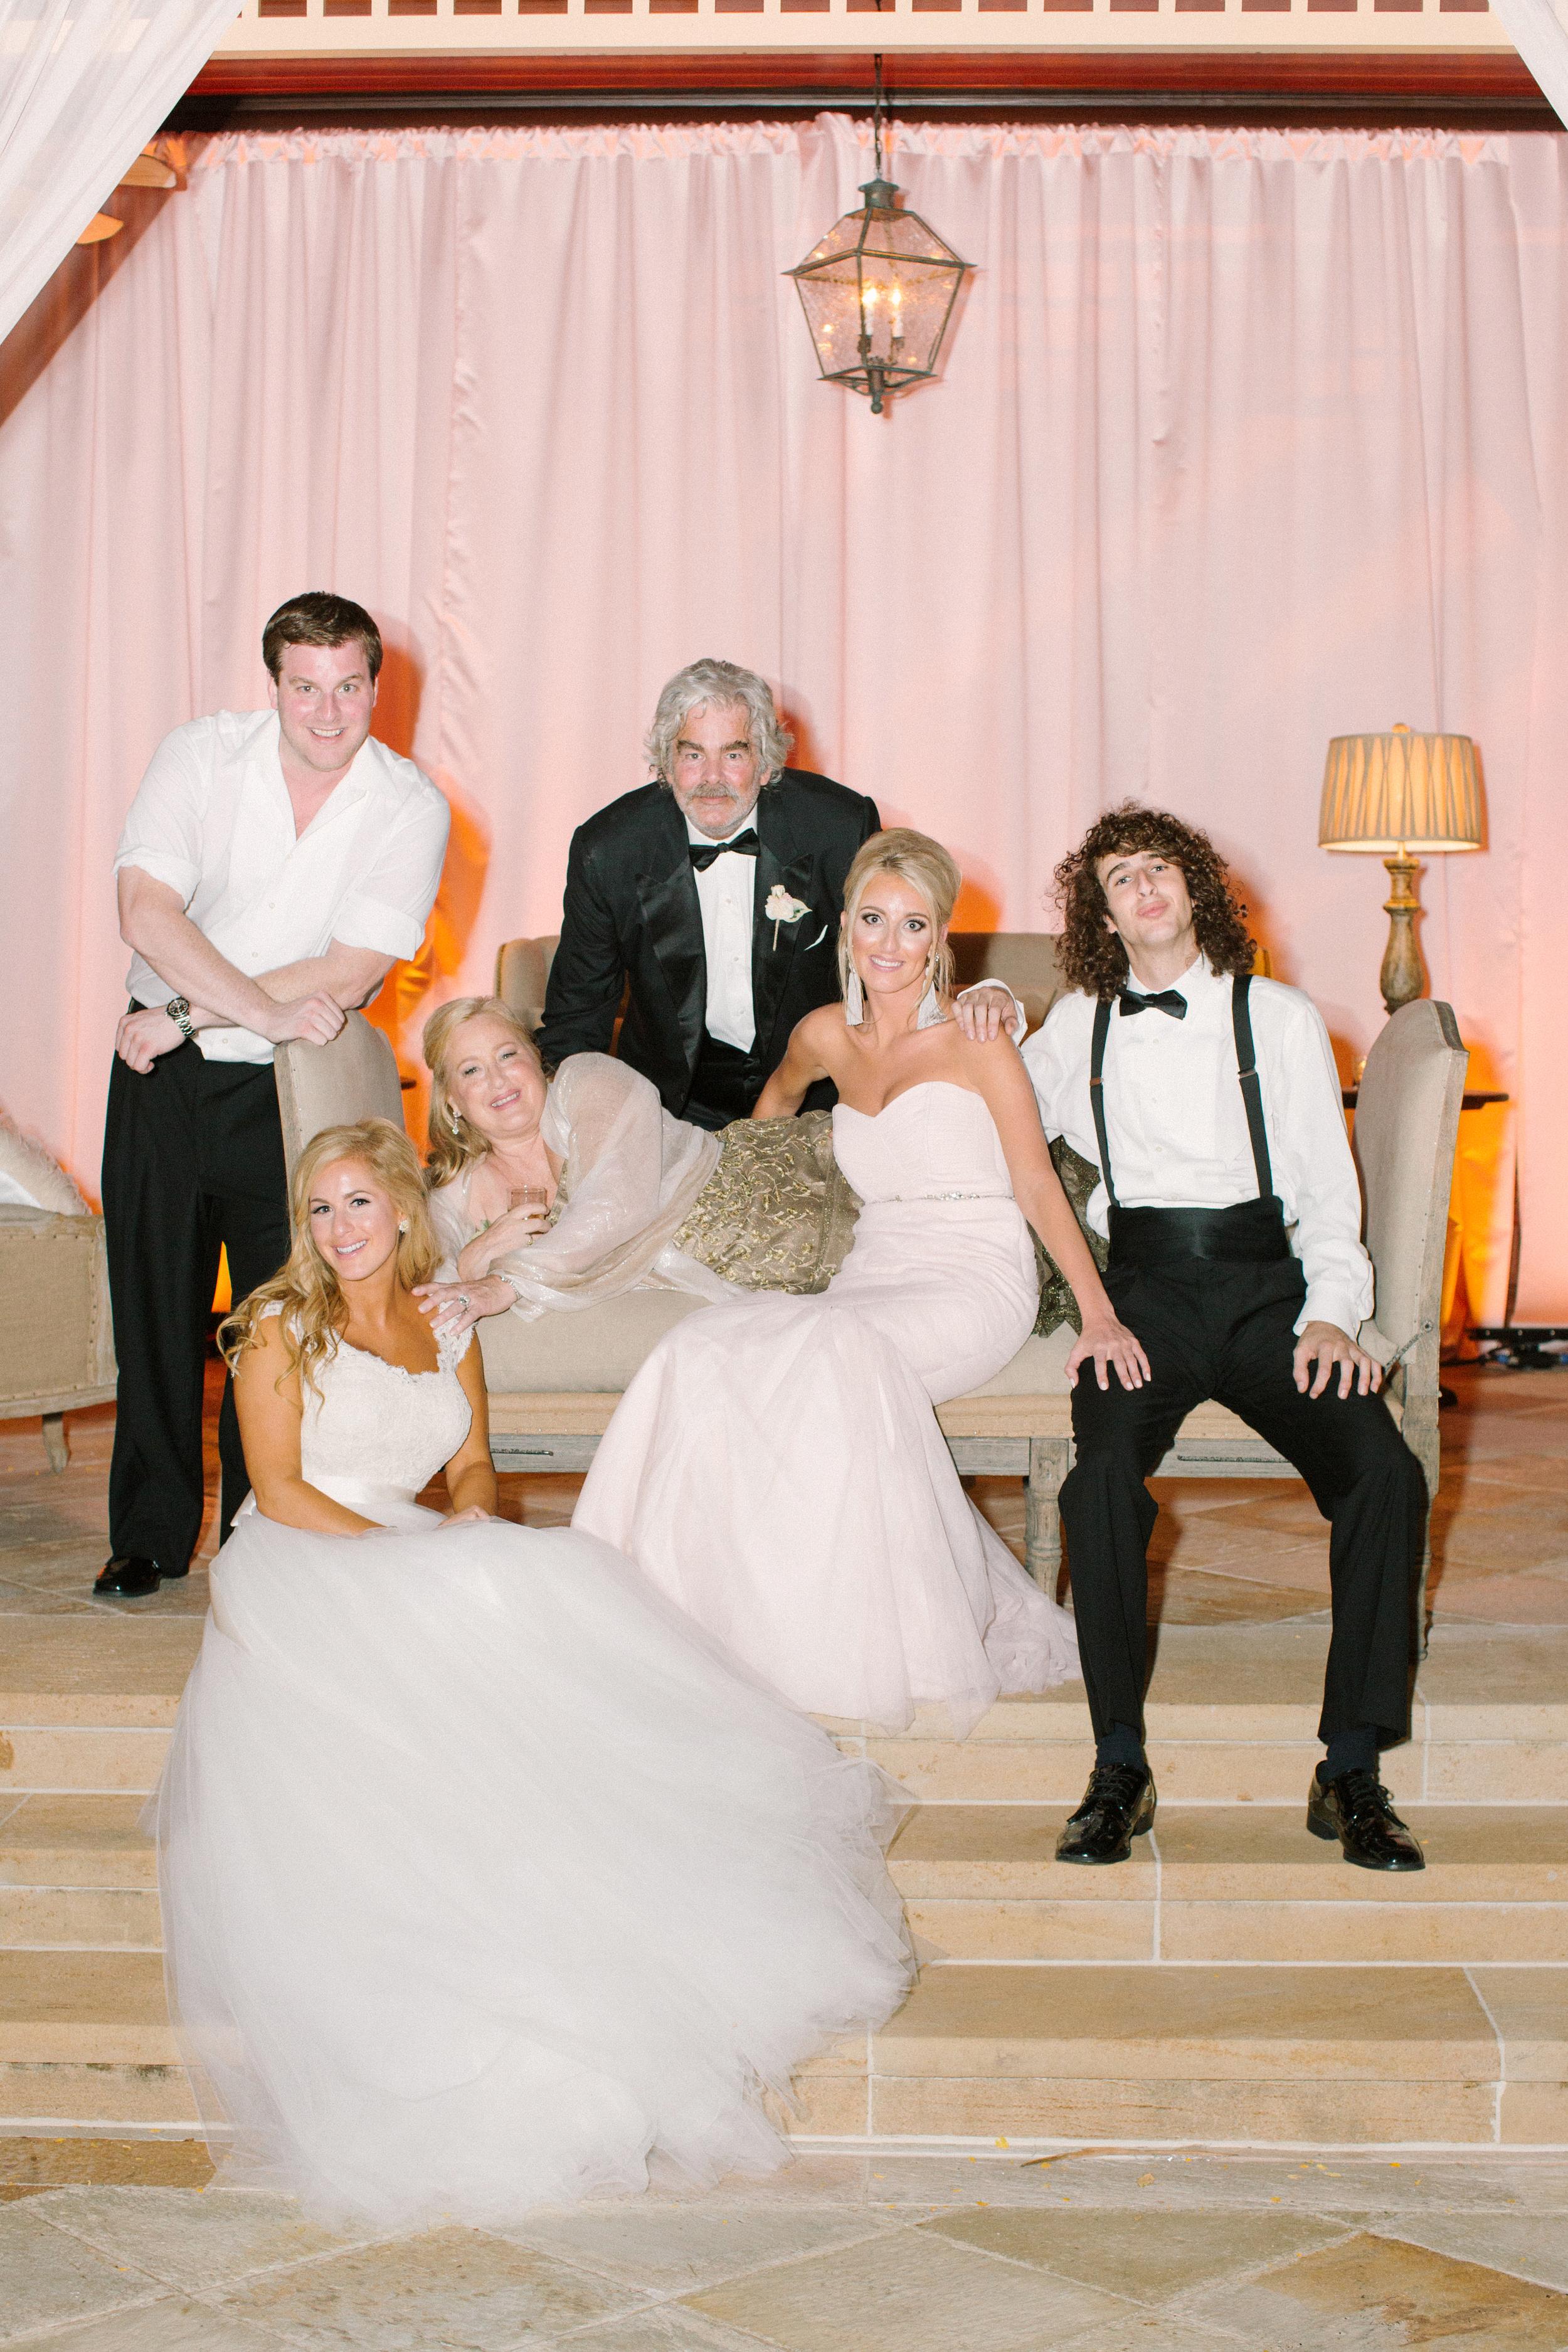 Ceci_New_York_Florida_Wedding_Style_Bride_Watercolor_Real_Custom_Luxury_143.jpg